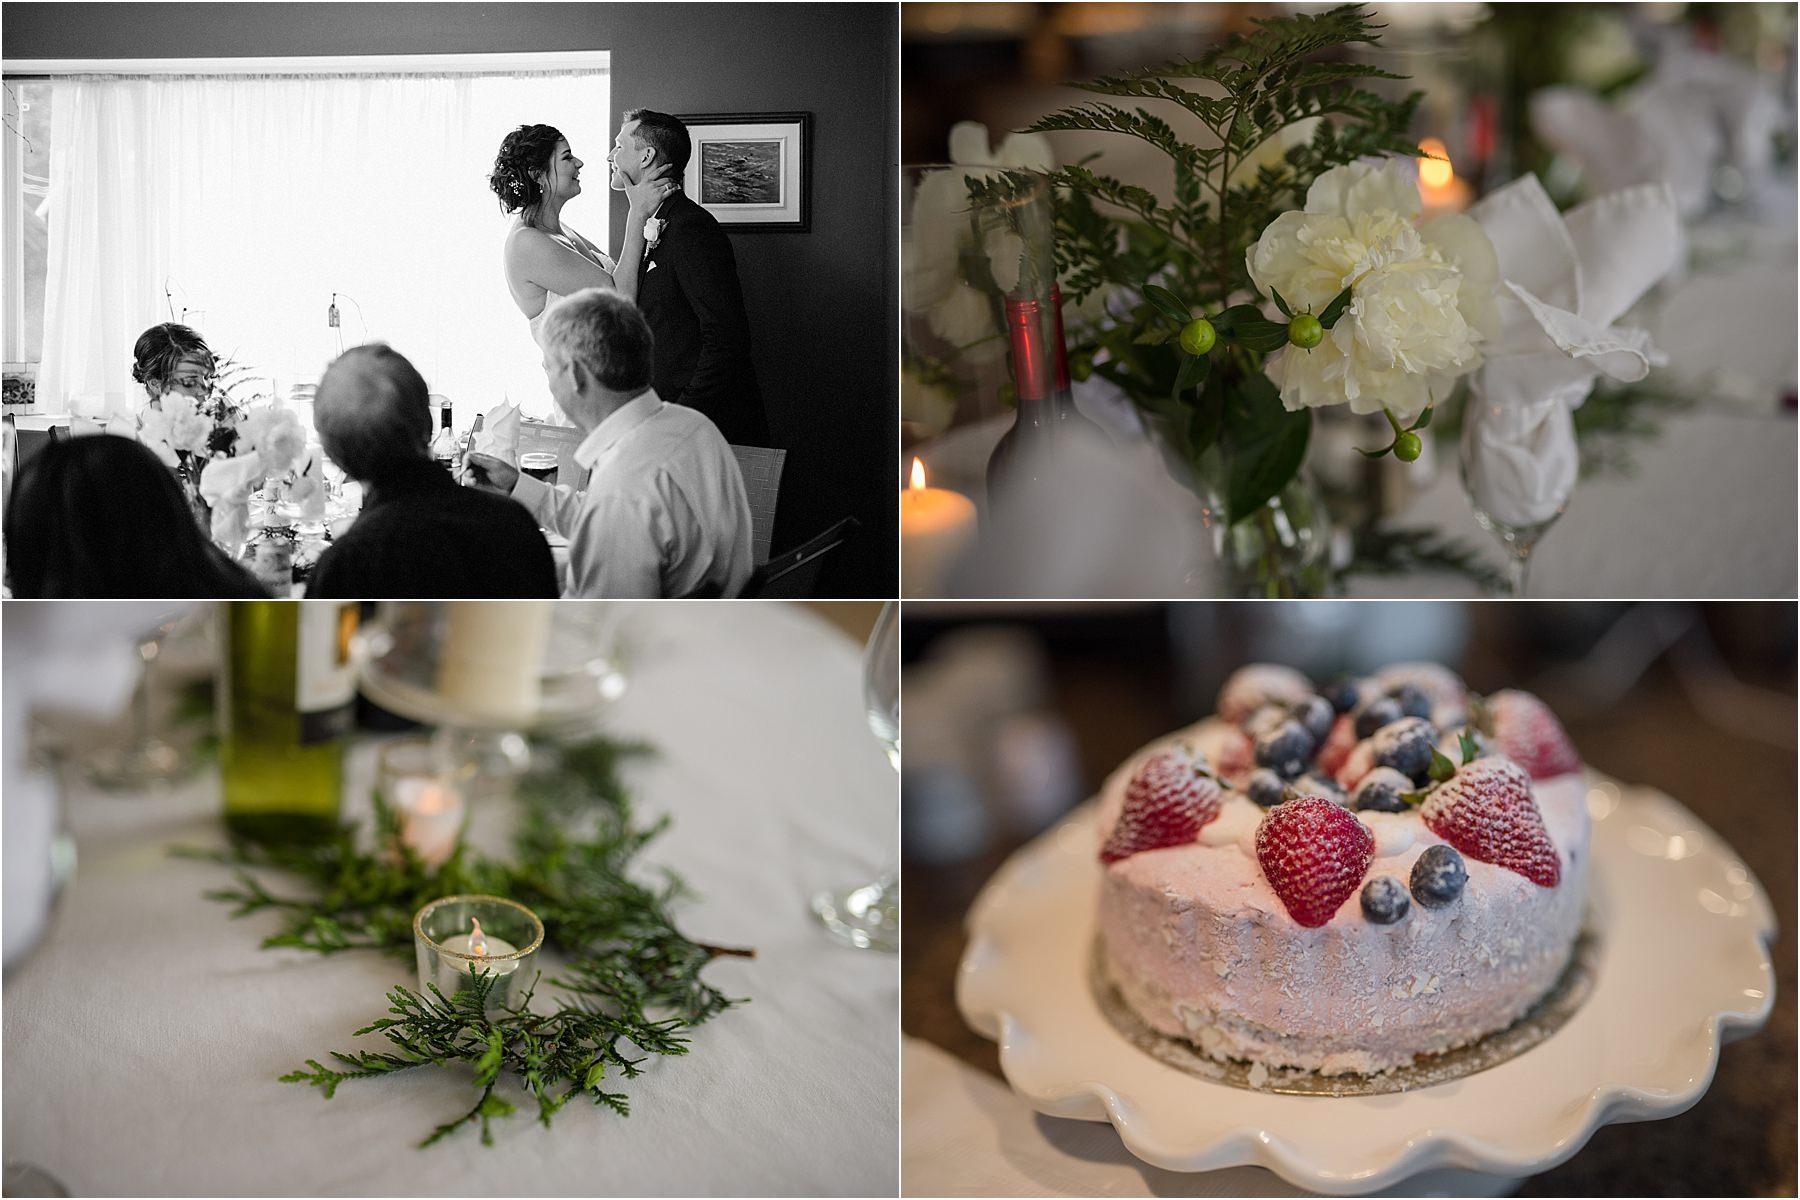 Kamloops wedding photographer details detail shot intimate reception venue ideas dinner florals pine centerpieces cake berries